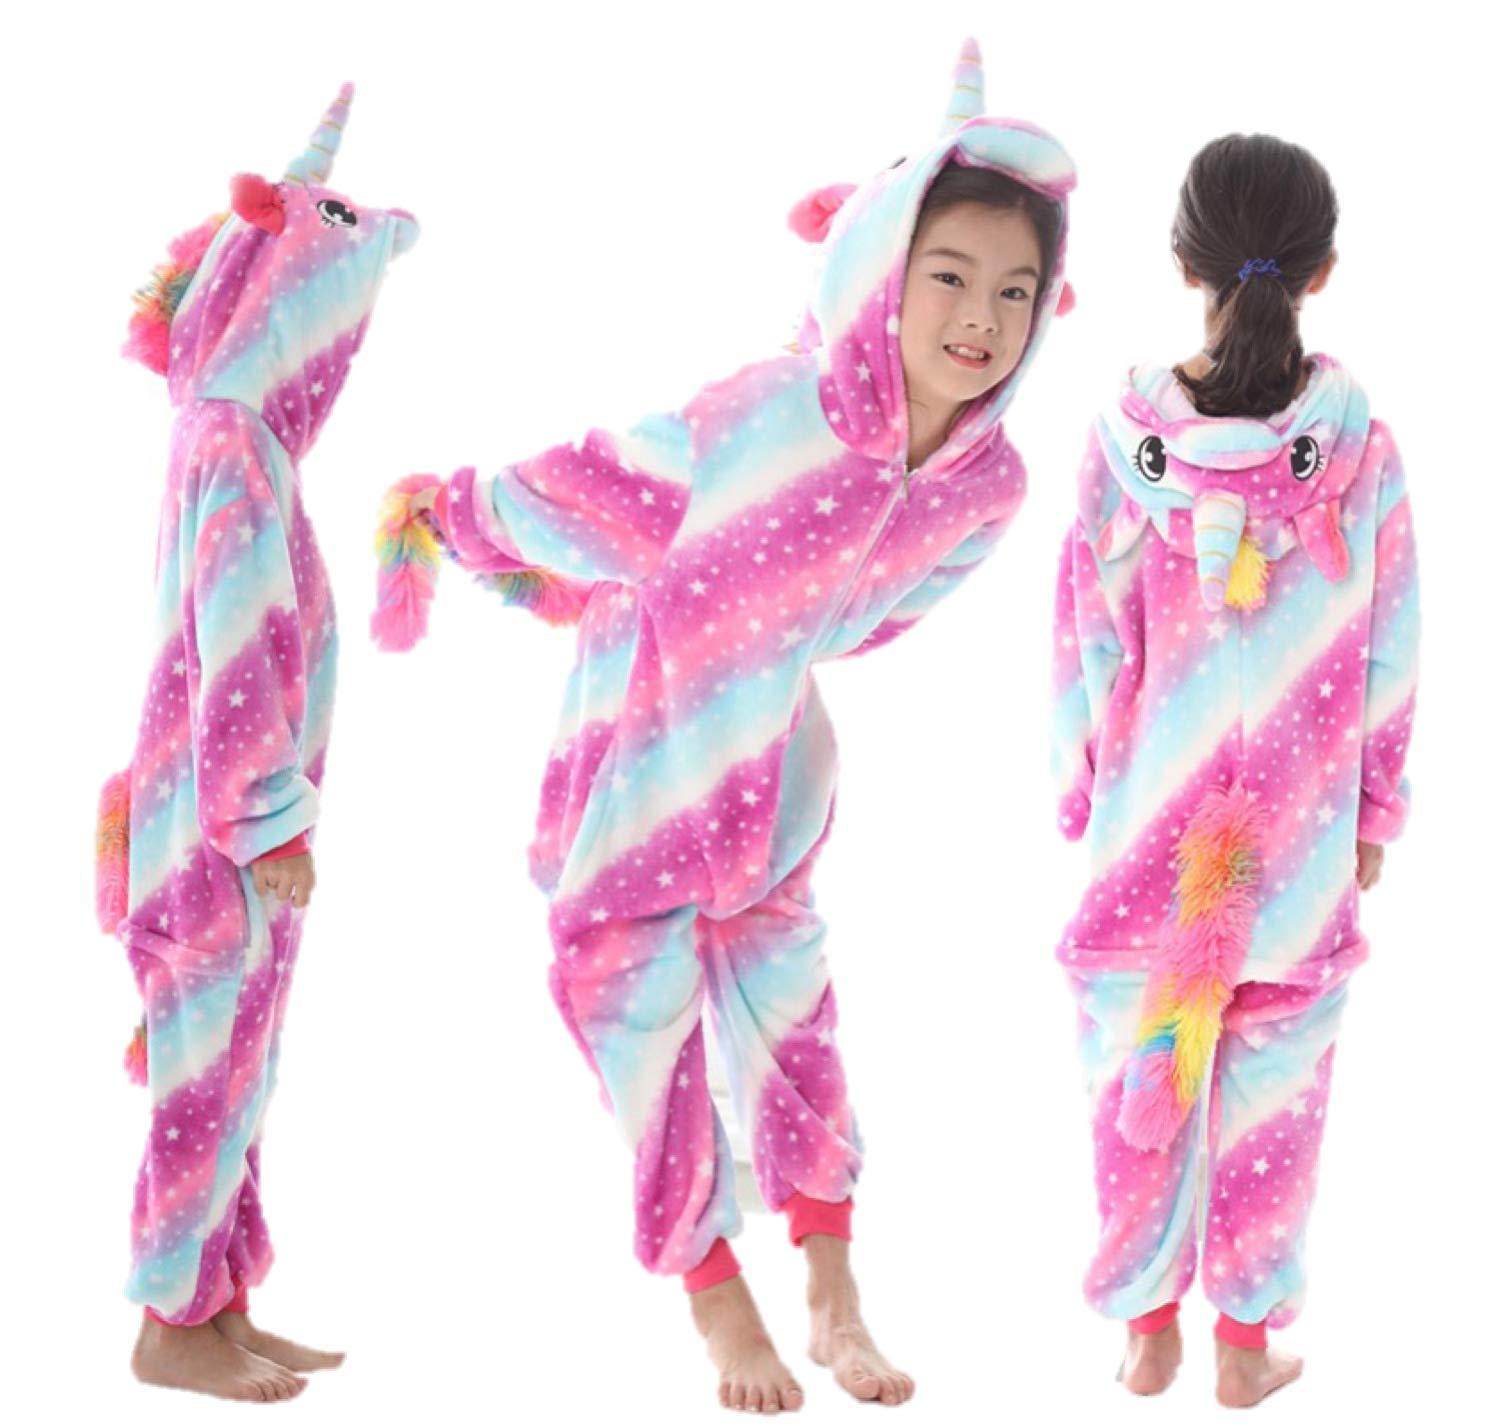 stella arcobaleno blu viola bianco Unicorn Panda Cat renna giraffa mucca corno bambini Onesie ragazze costume loungewear loungewear ragazze bambini (6 - 8 anni, Turbinii rosa e blu con stelle) Ecommerce Trade Ltd